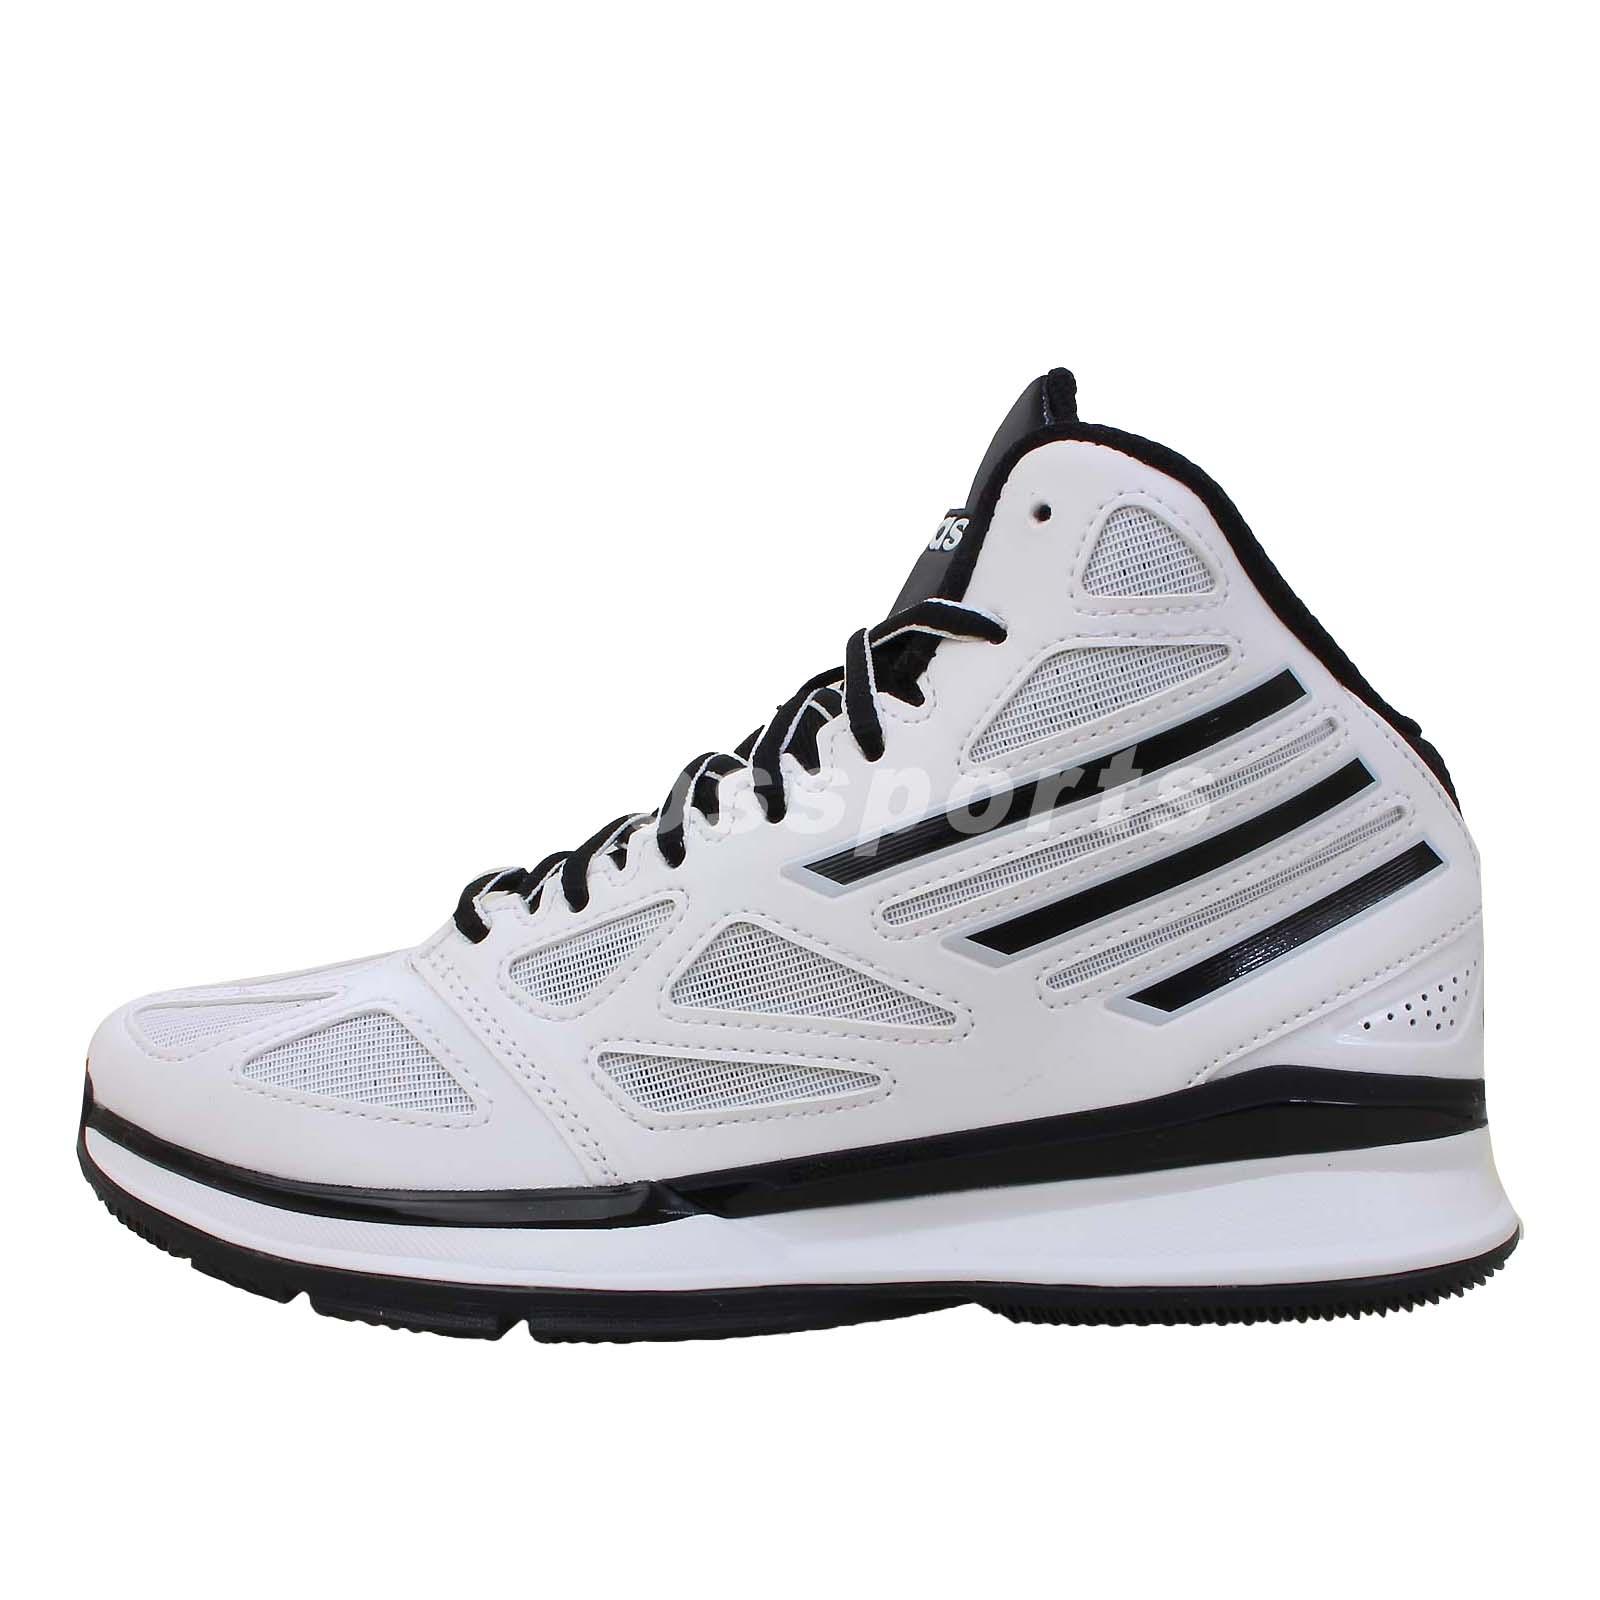 Adidas Boy S Youth Ghost Basketball Shoe Royal White Black